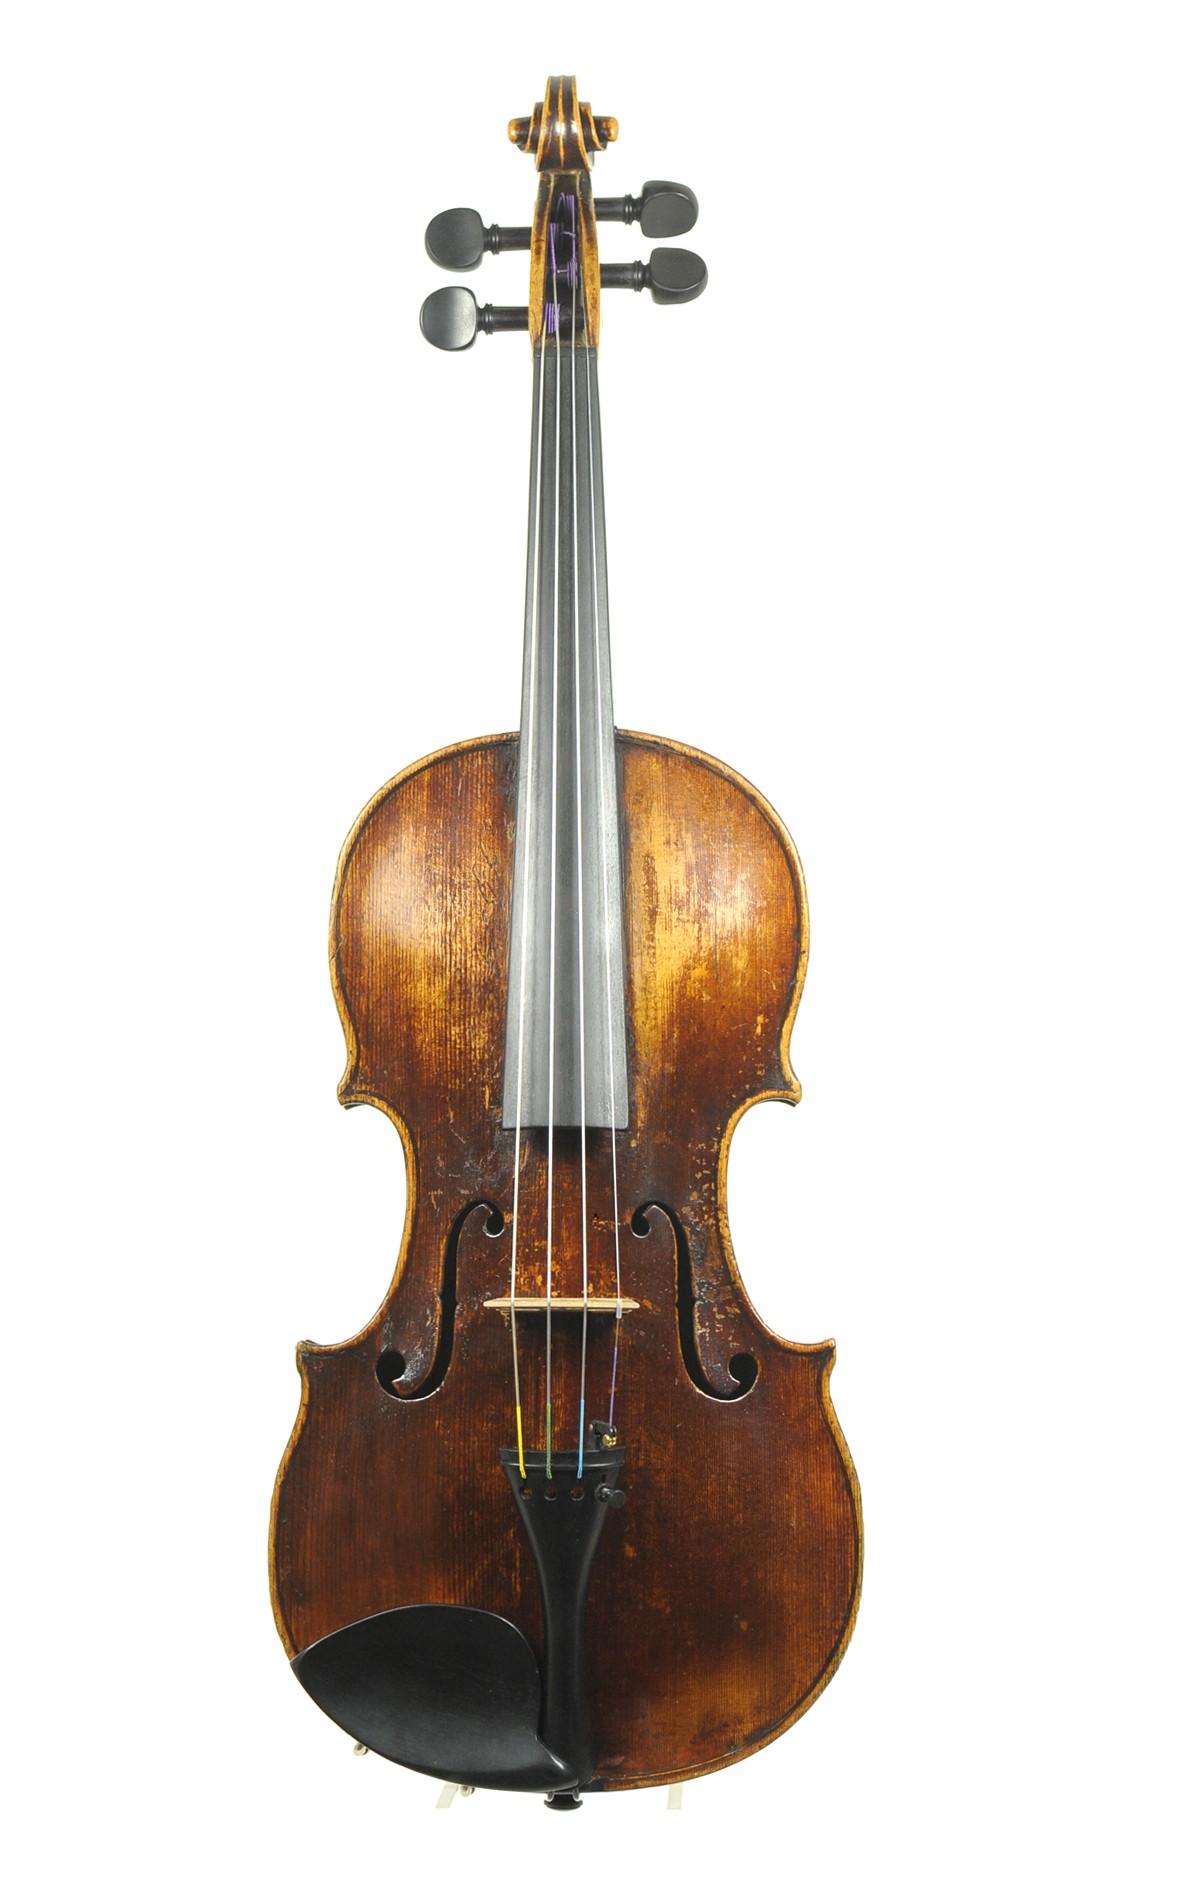 Johann Georg Leeb, Preßburg, 1786 - Geigen Decke